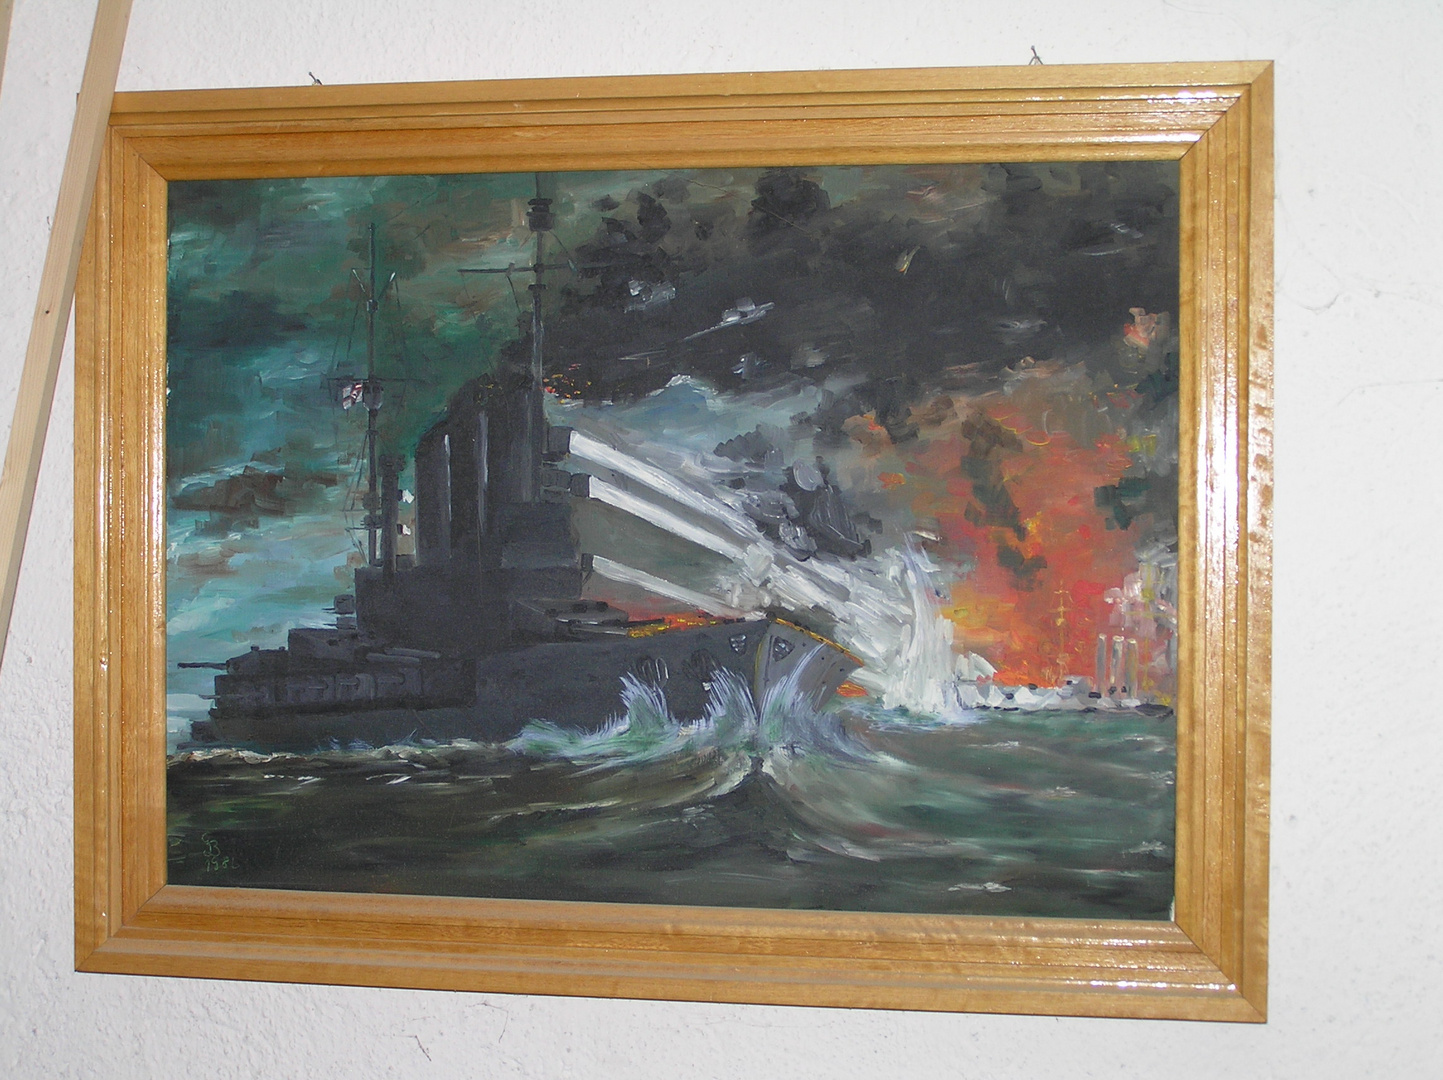 Kampf auf hoher See